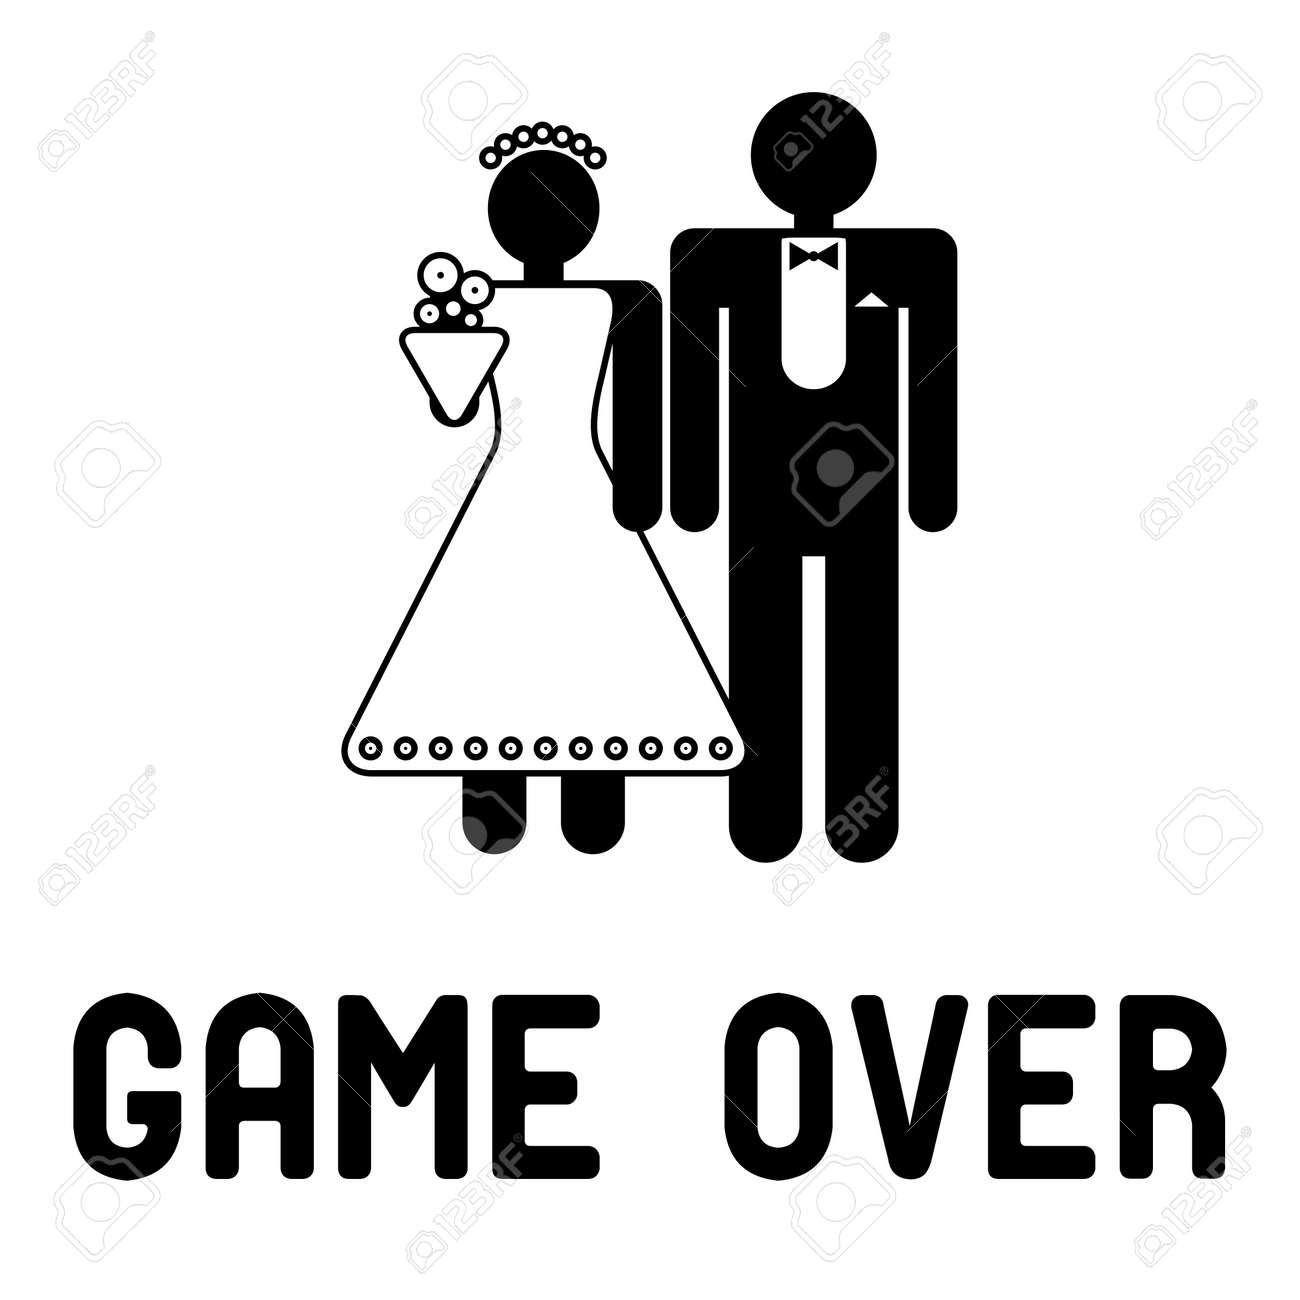 Funny wedding symbol - Game Over - 14358318